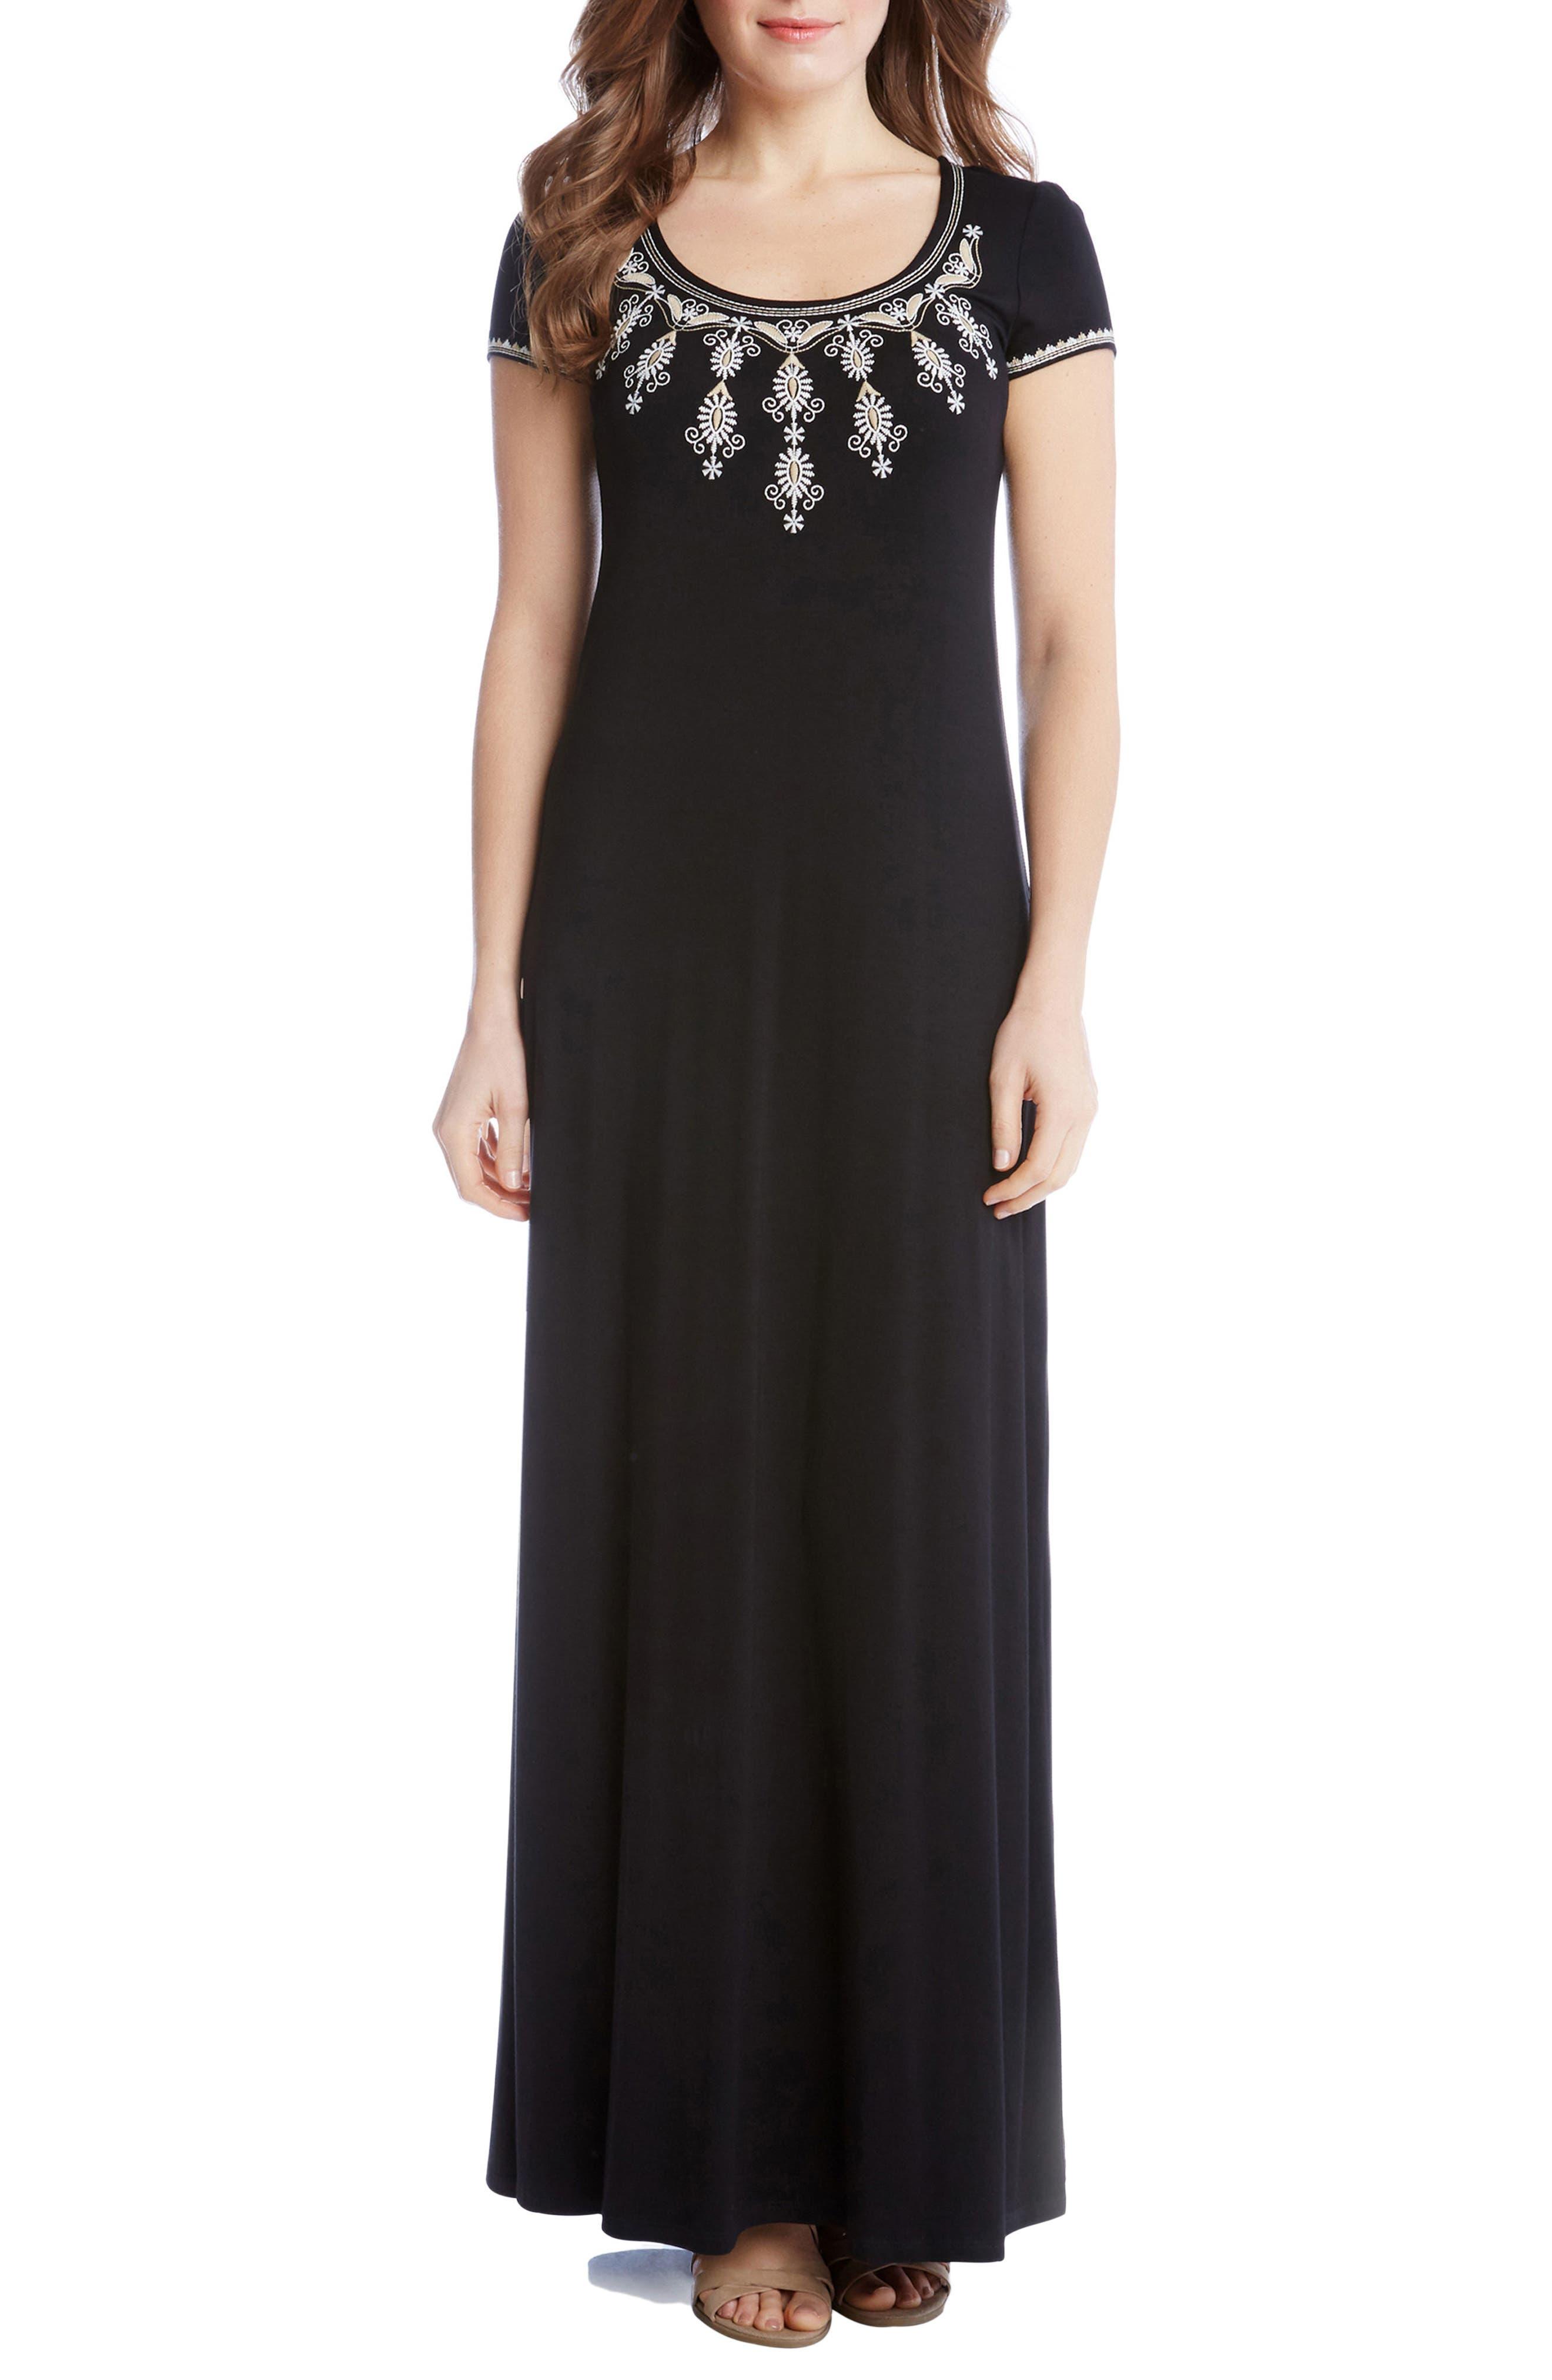 Embroidered Cap Sleeve Maxi Dress,                             Main thumbnail 1, color,                             001